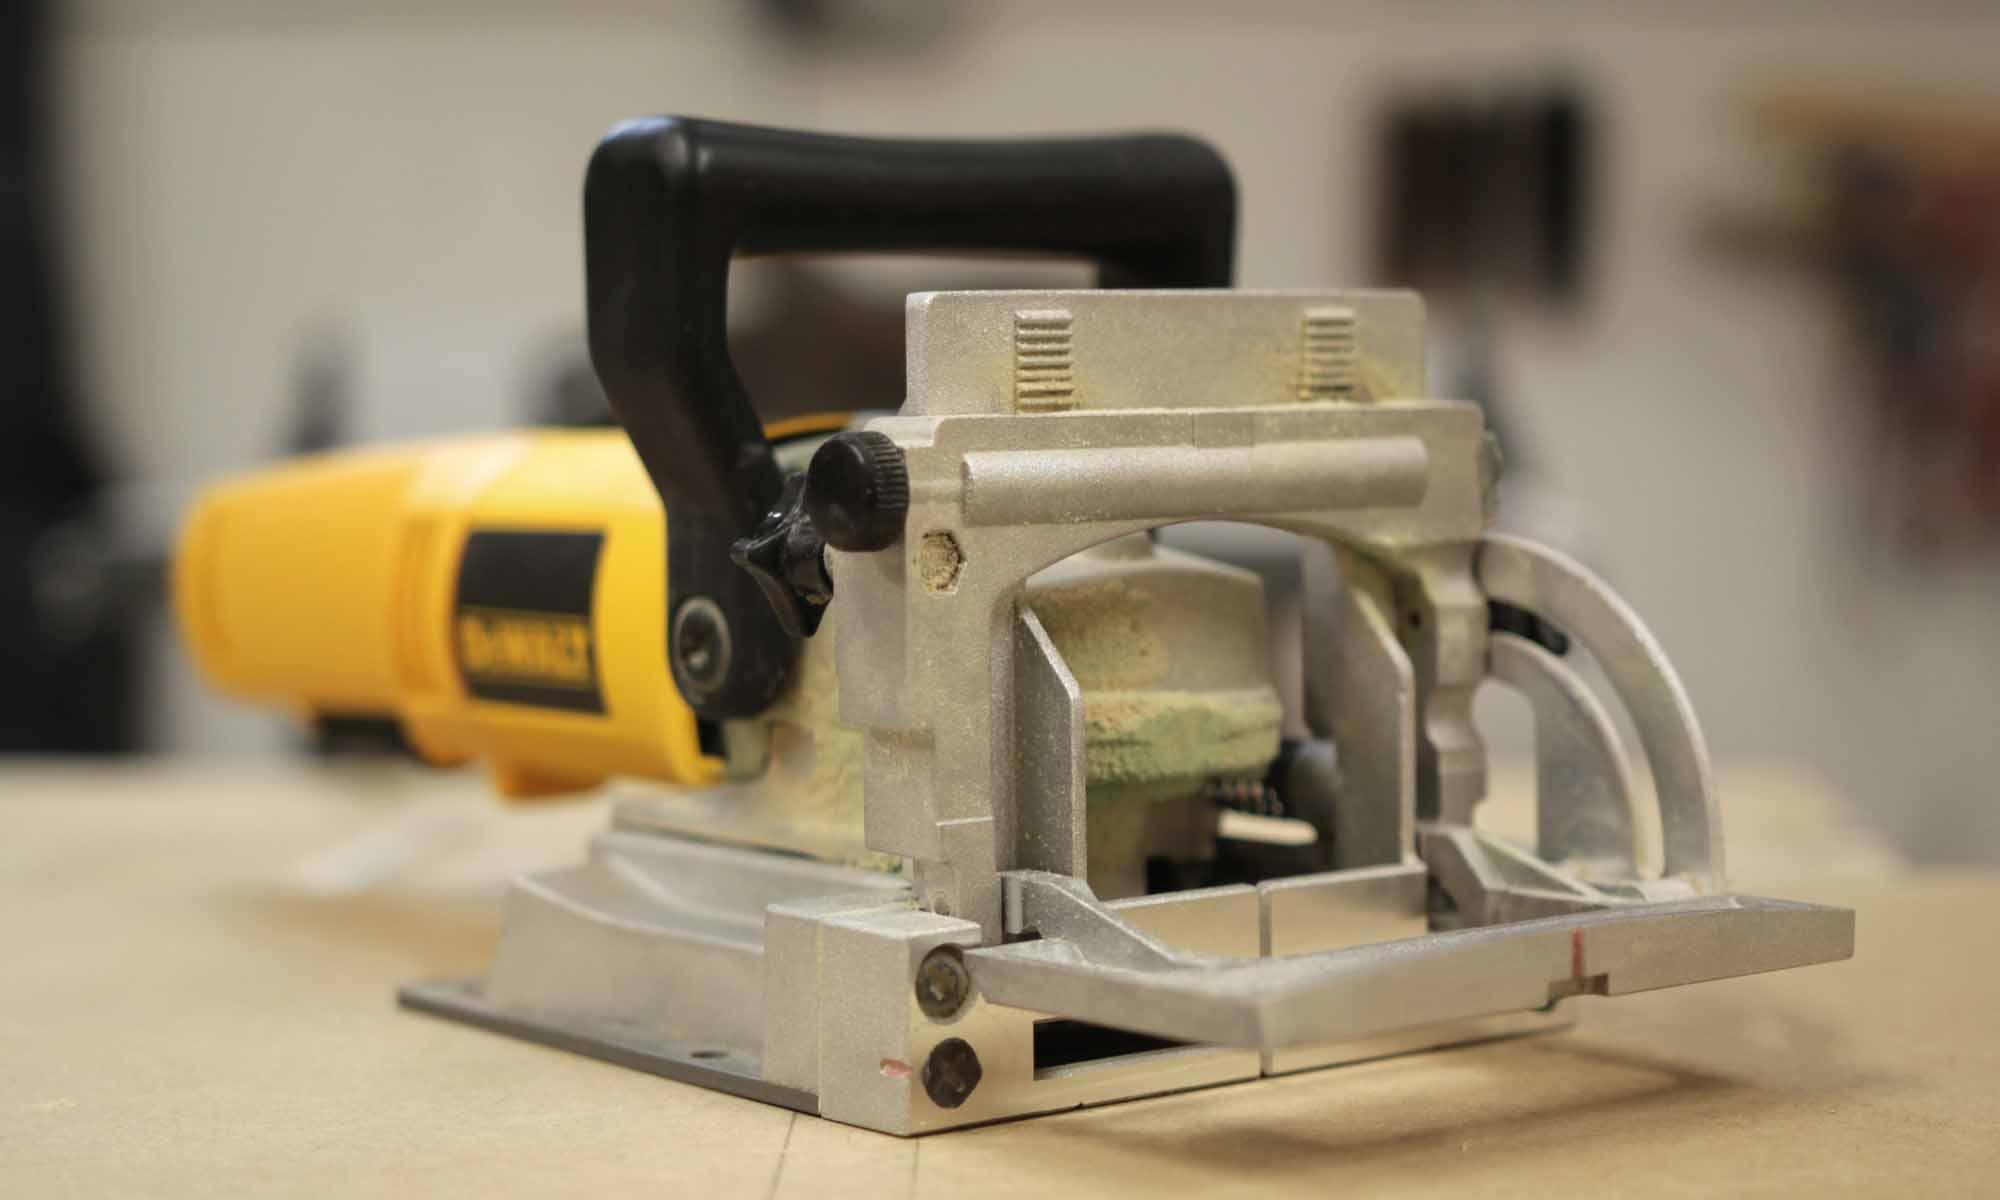 top 10 biscuit jointer tips & tricks! - gosforth handyman